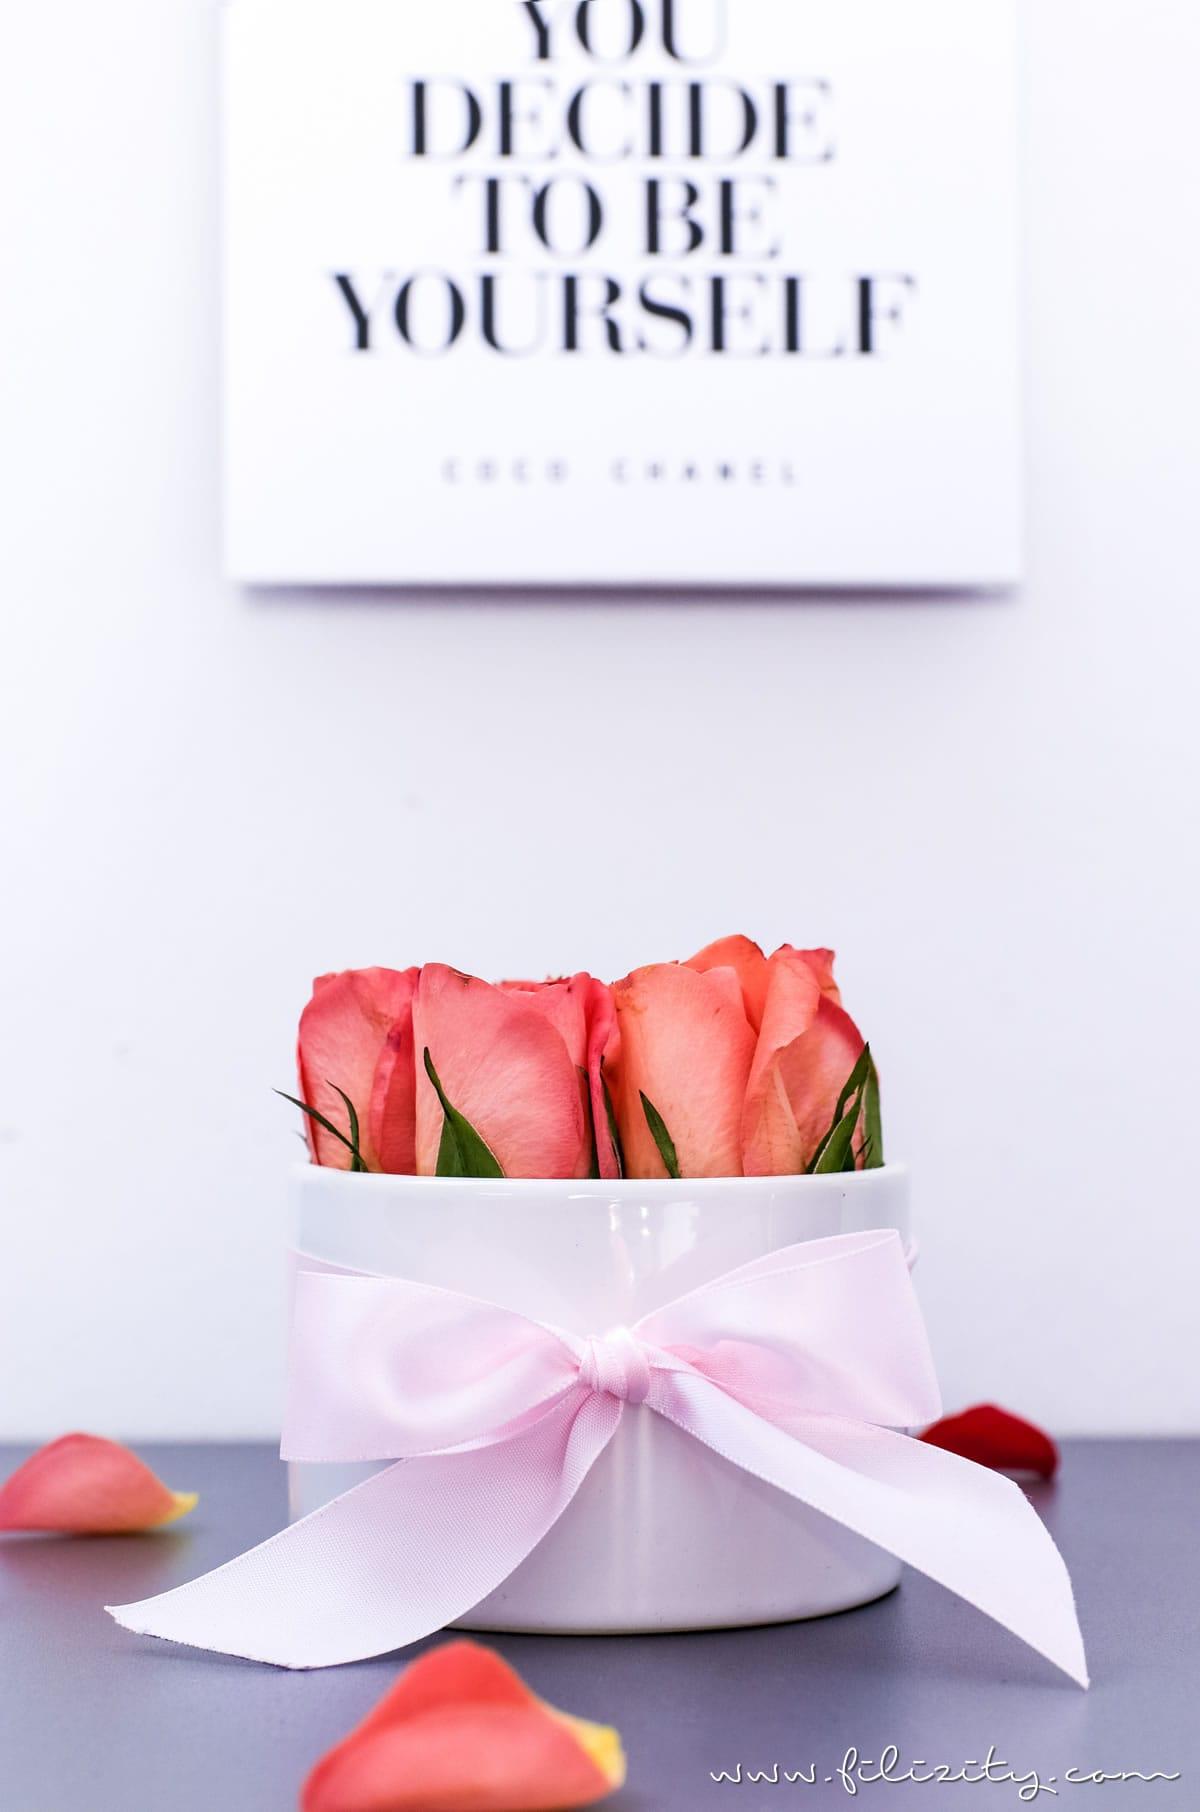 3x flowerbox selber machen diy geschenkidee deko. Black Bedroom Furniture Sets. Home Design Ideas